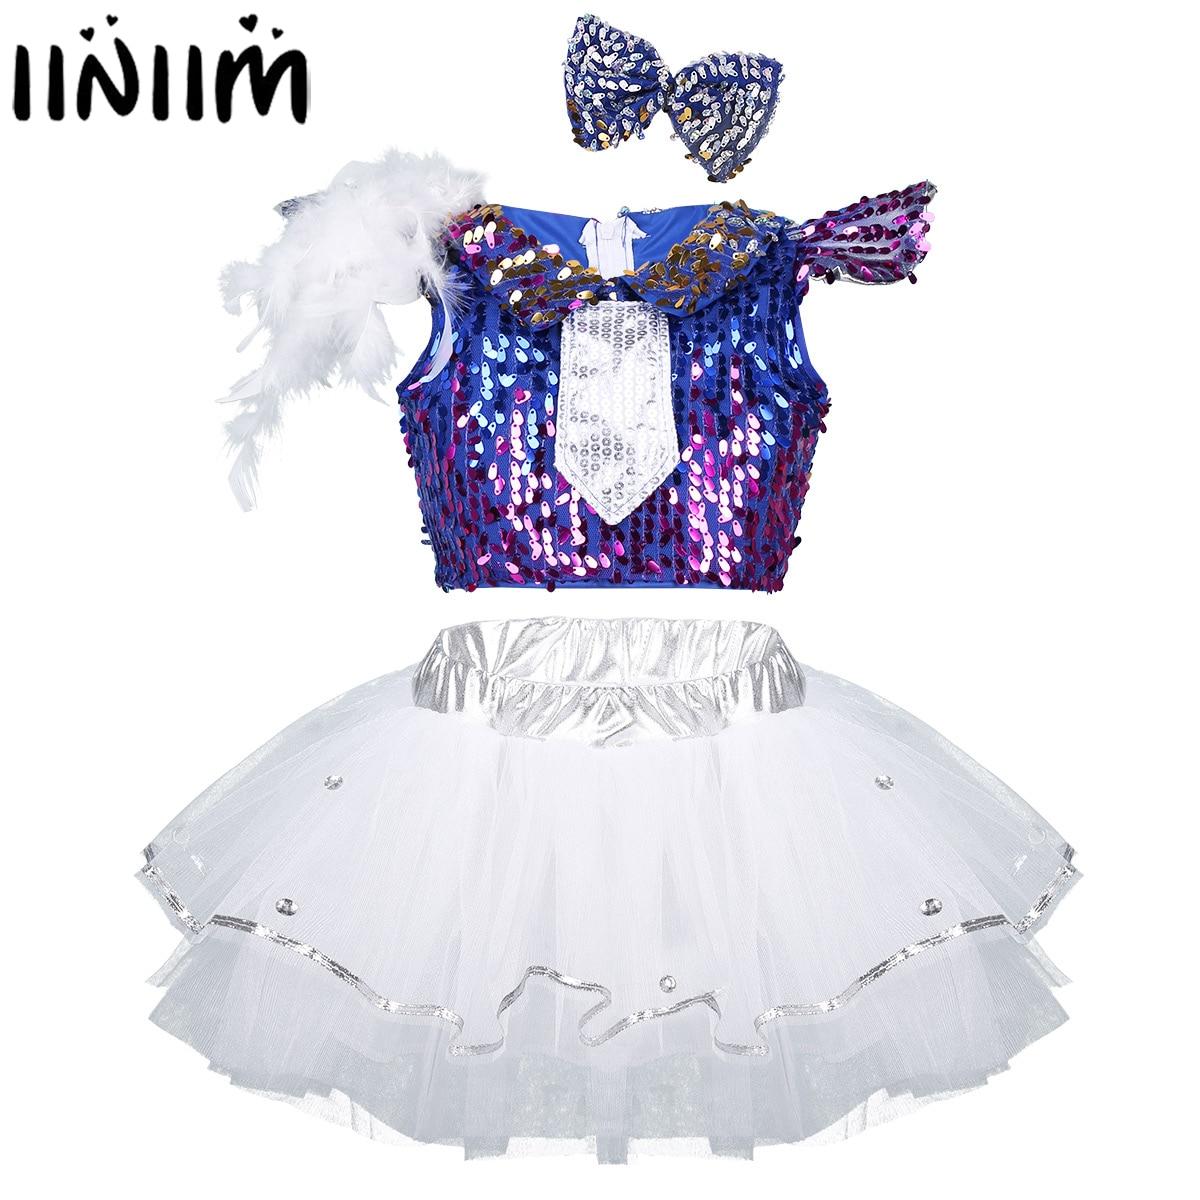 iiniim Kids Girls Jazz Dancewear Shiny Sequins Dancing Costumes Dress Up Feather Cap Sleeves Crop Top with Tutu Skirts Hair Clip